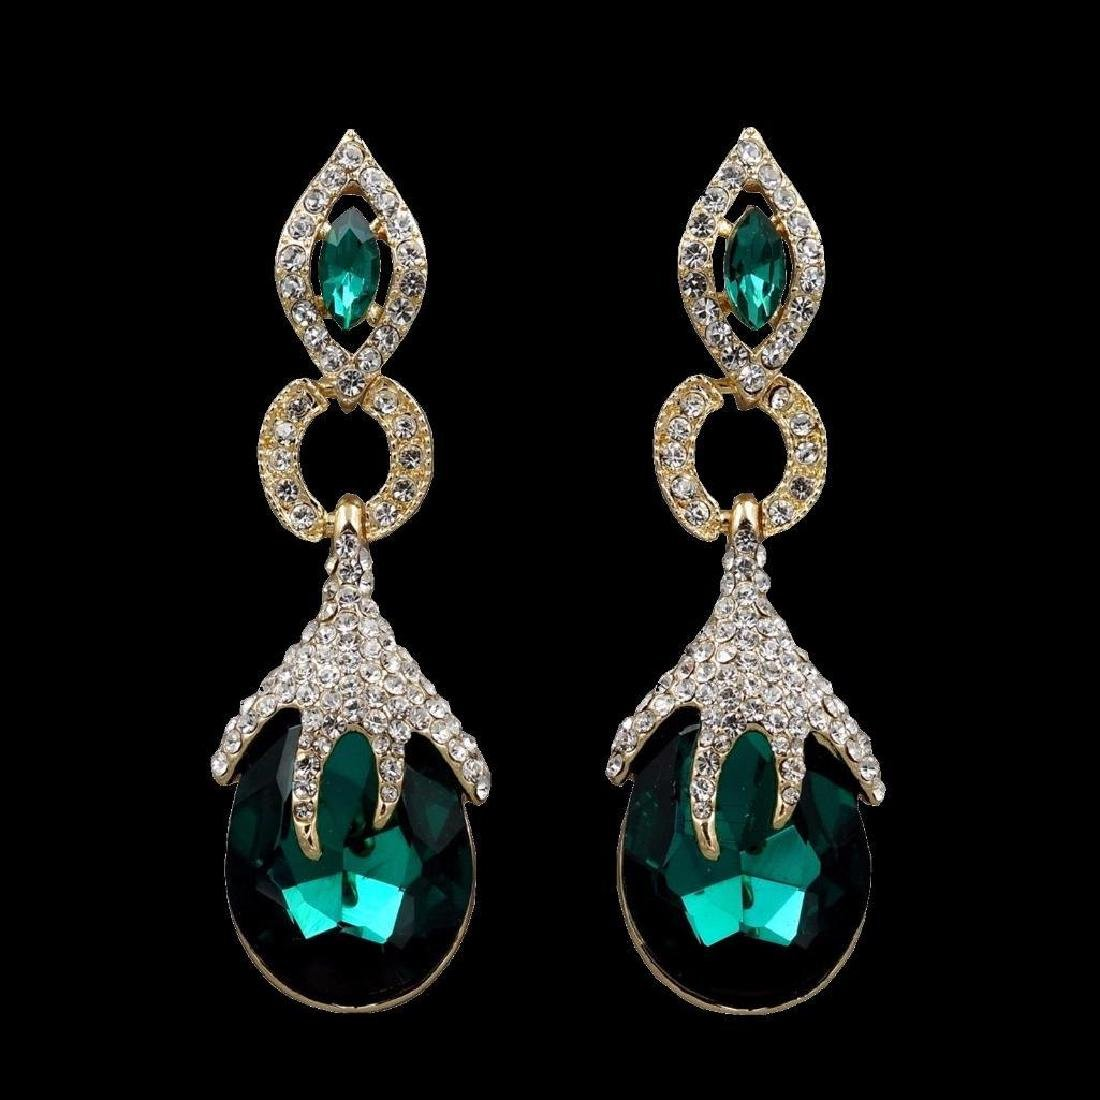 18k Gold Plated Gp Emerald Green Crystal Rhinestone